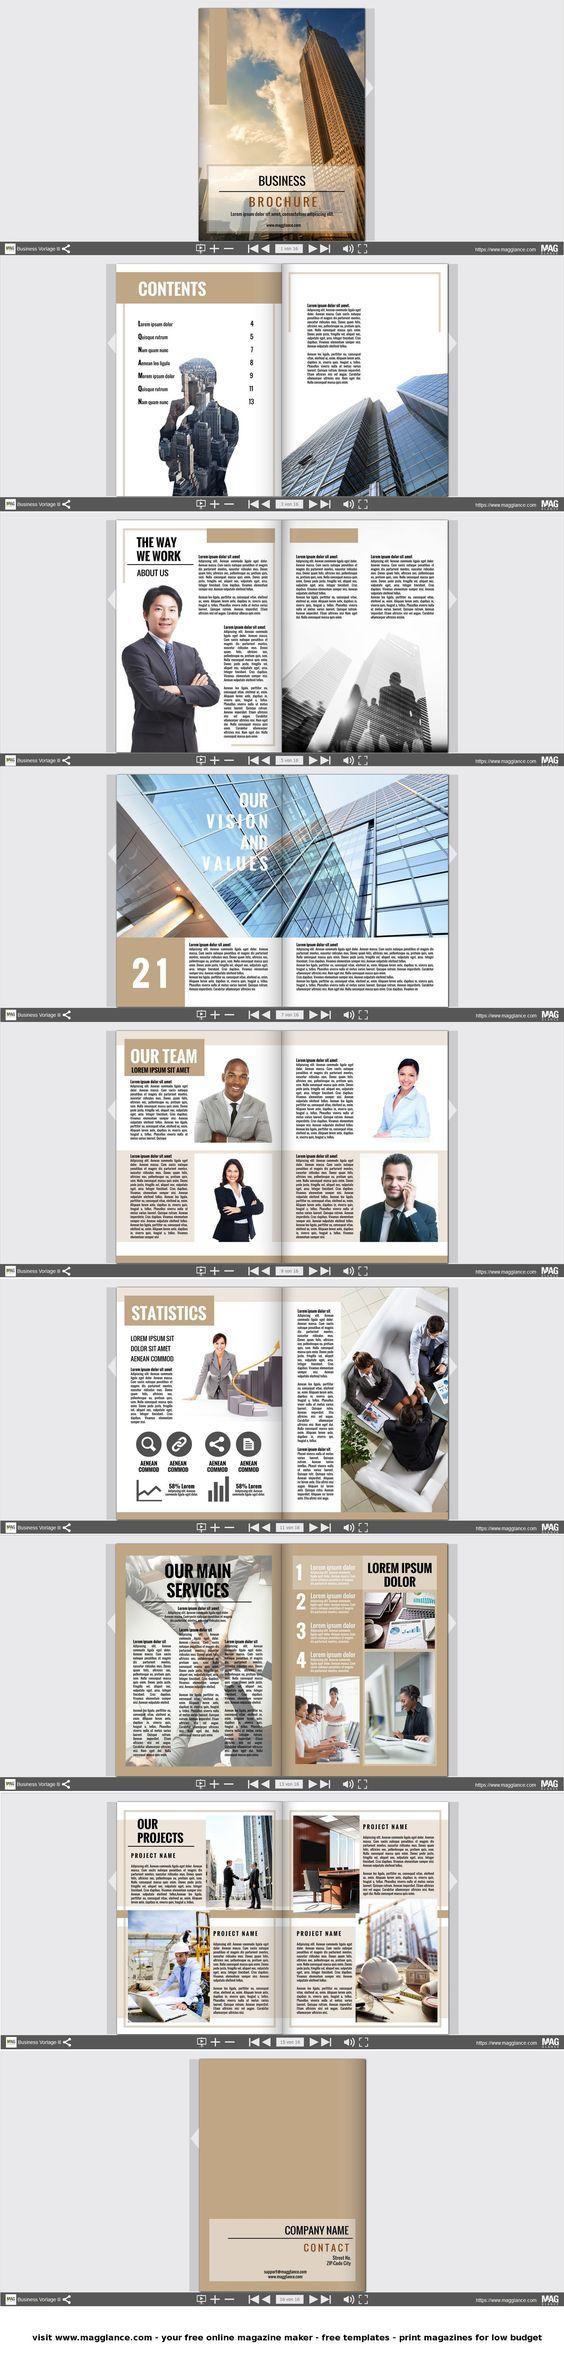 Fabuleux Oltre 25 idee originali per Copertina per brochure su Pinterest  NY74